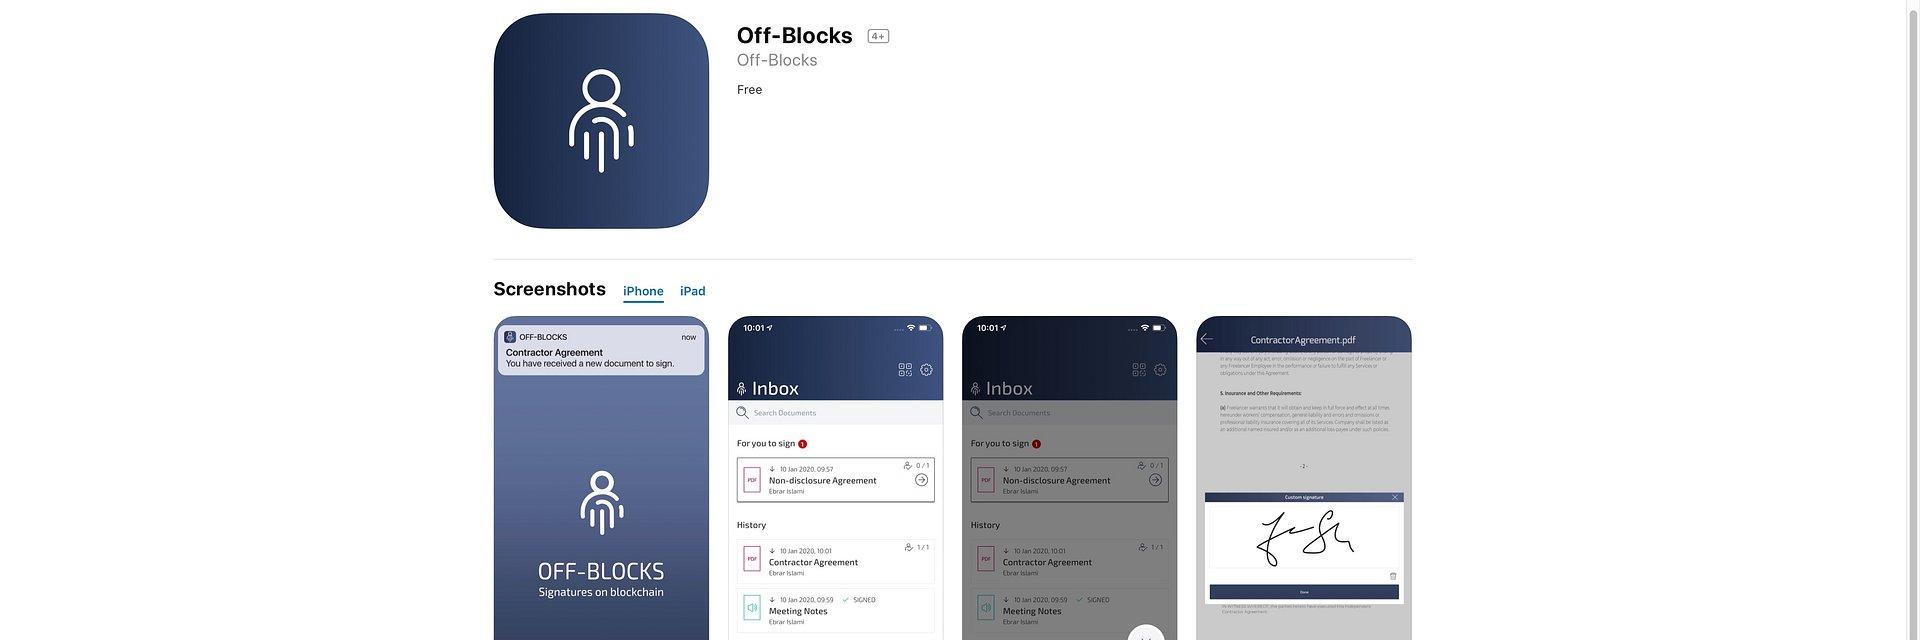 App Store Launch